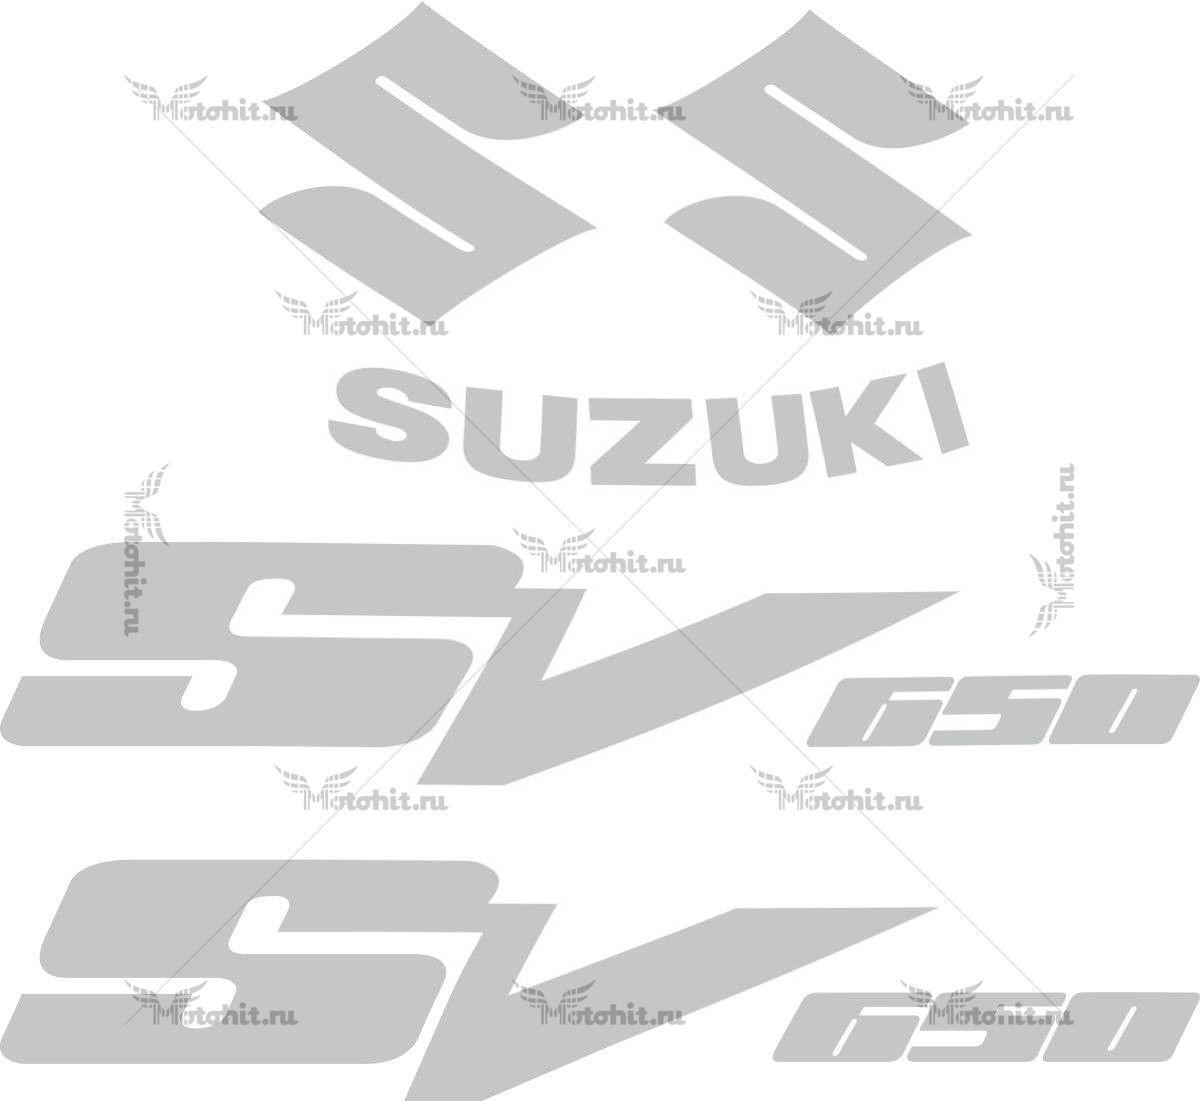 Комплект наклеек SUZUKI SV-650 1999-2010 SILVER